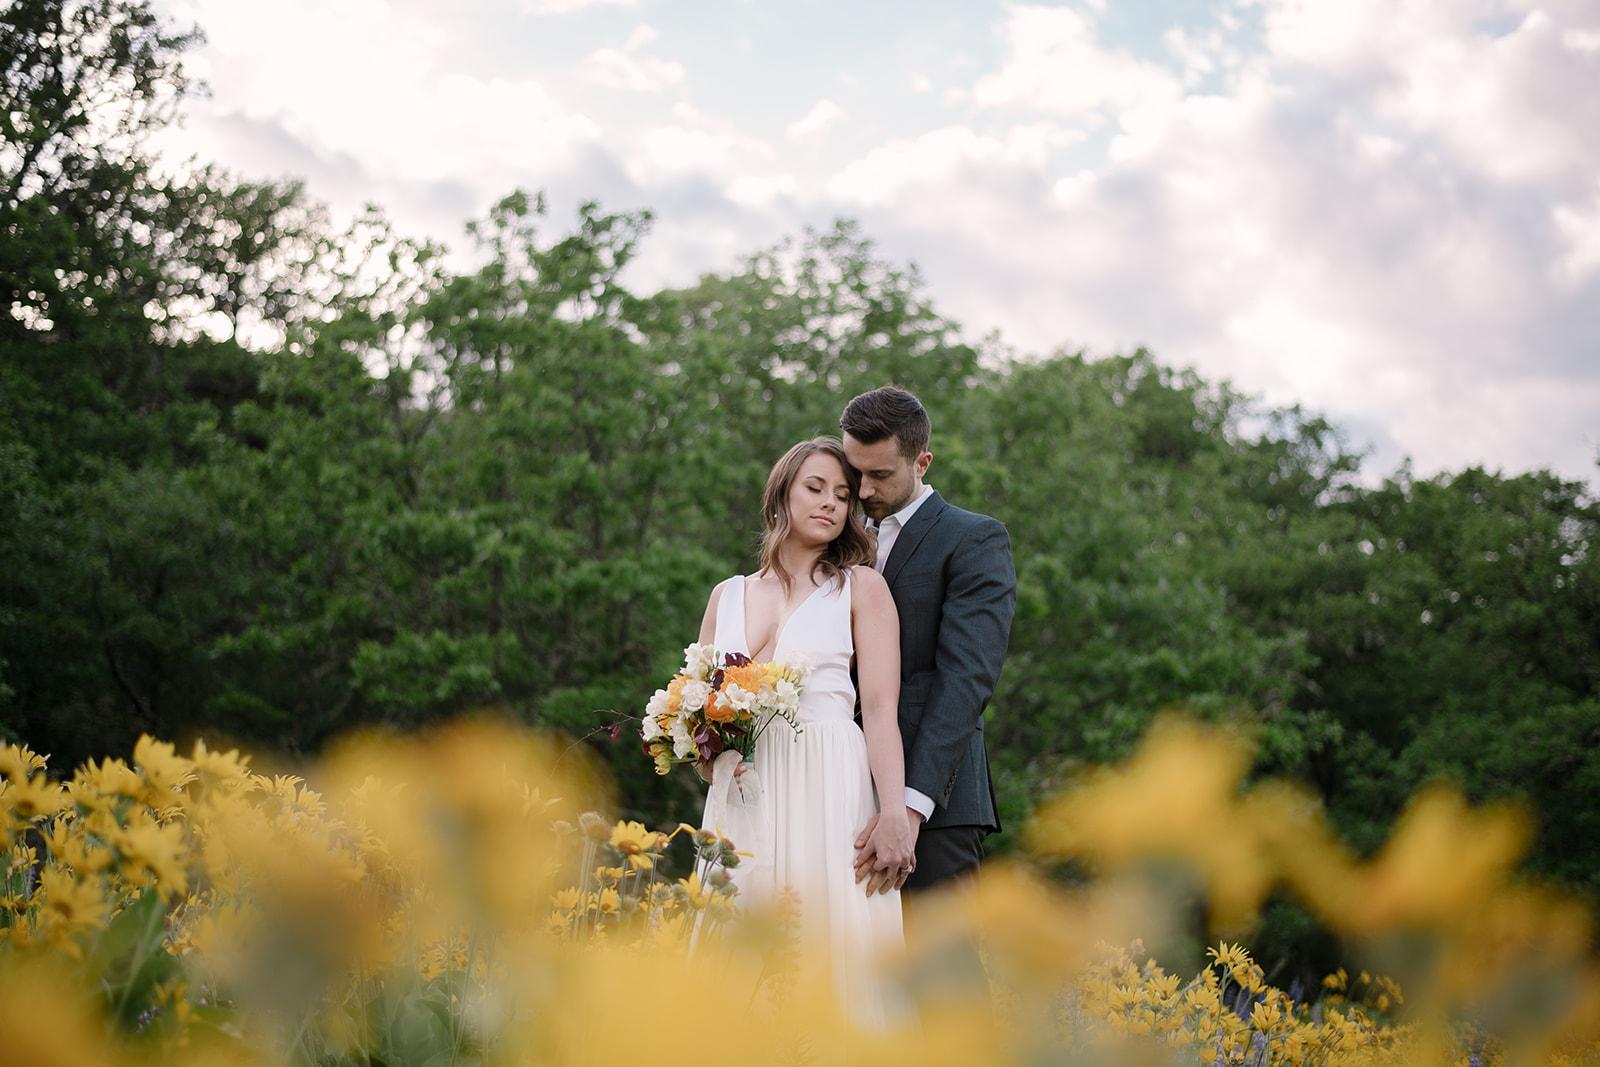 kamea_events_wedding_planner_portland_DeusAmor37.jpg